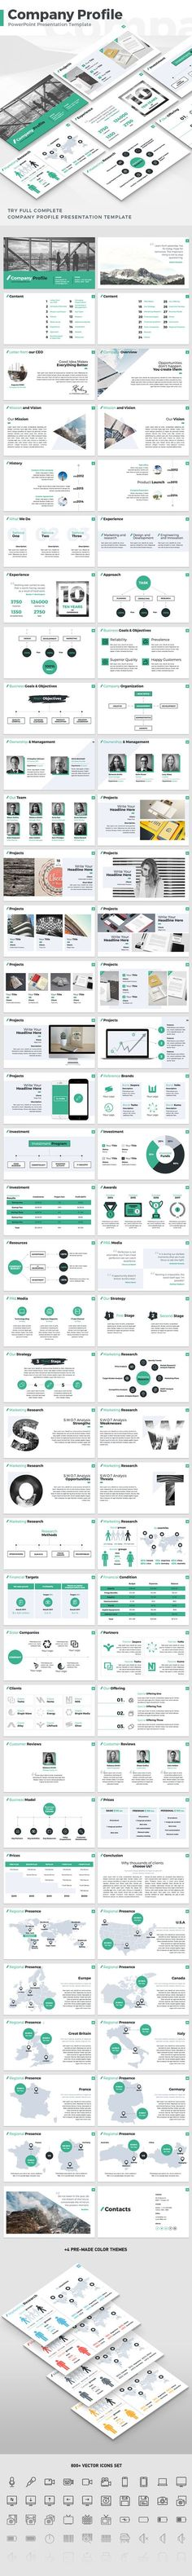 DAZE - Ultimate Business Muse Template UX\/UI Designer, Adobe and Gym - company portfolio template